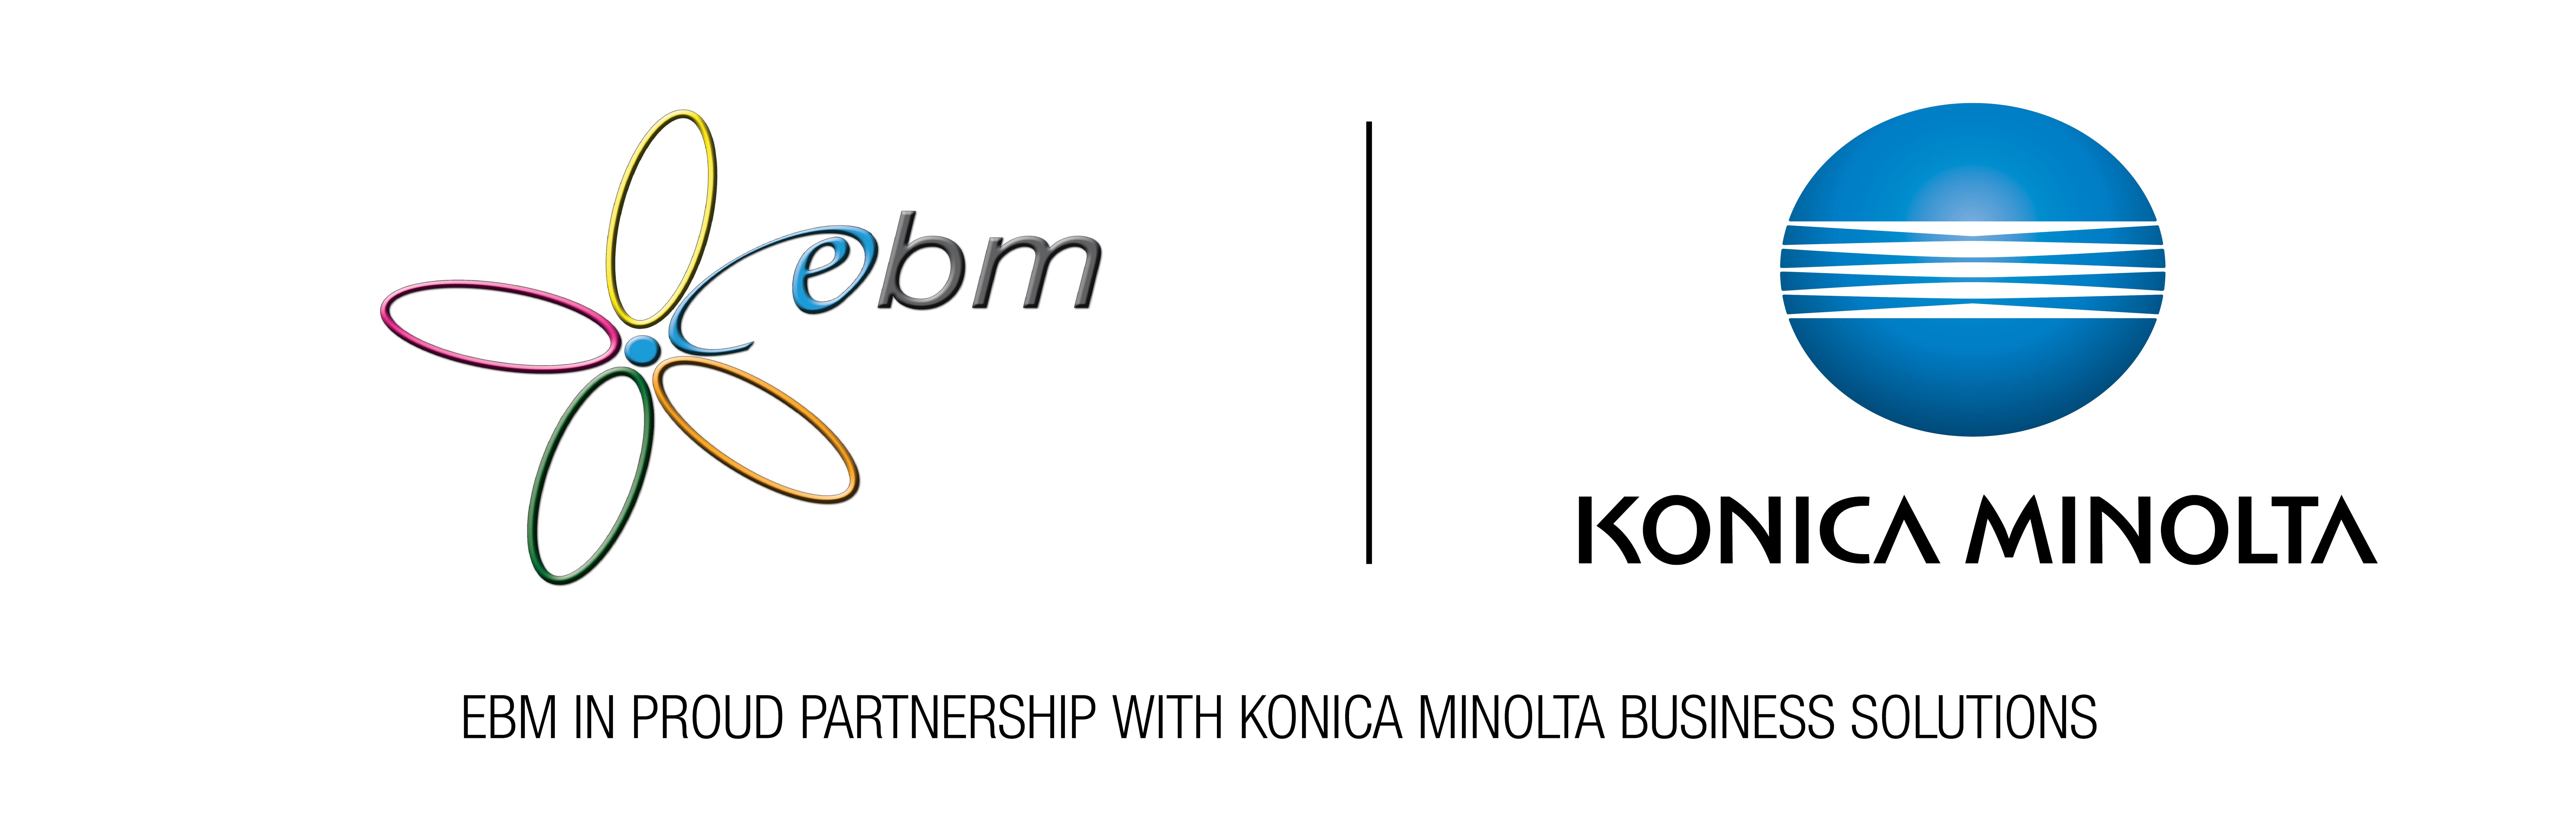 EBM in Partnership with Konica Minolta